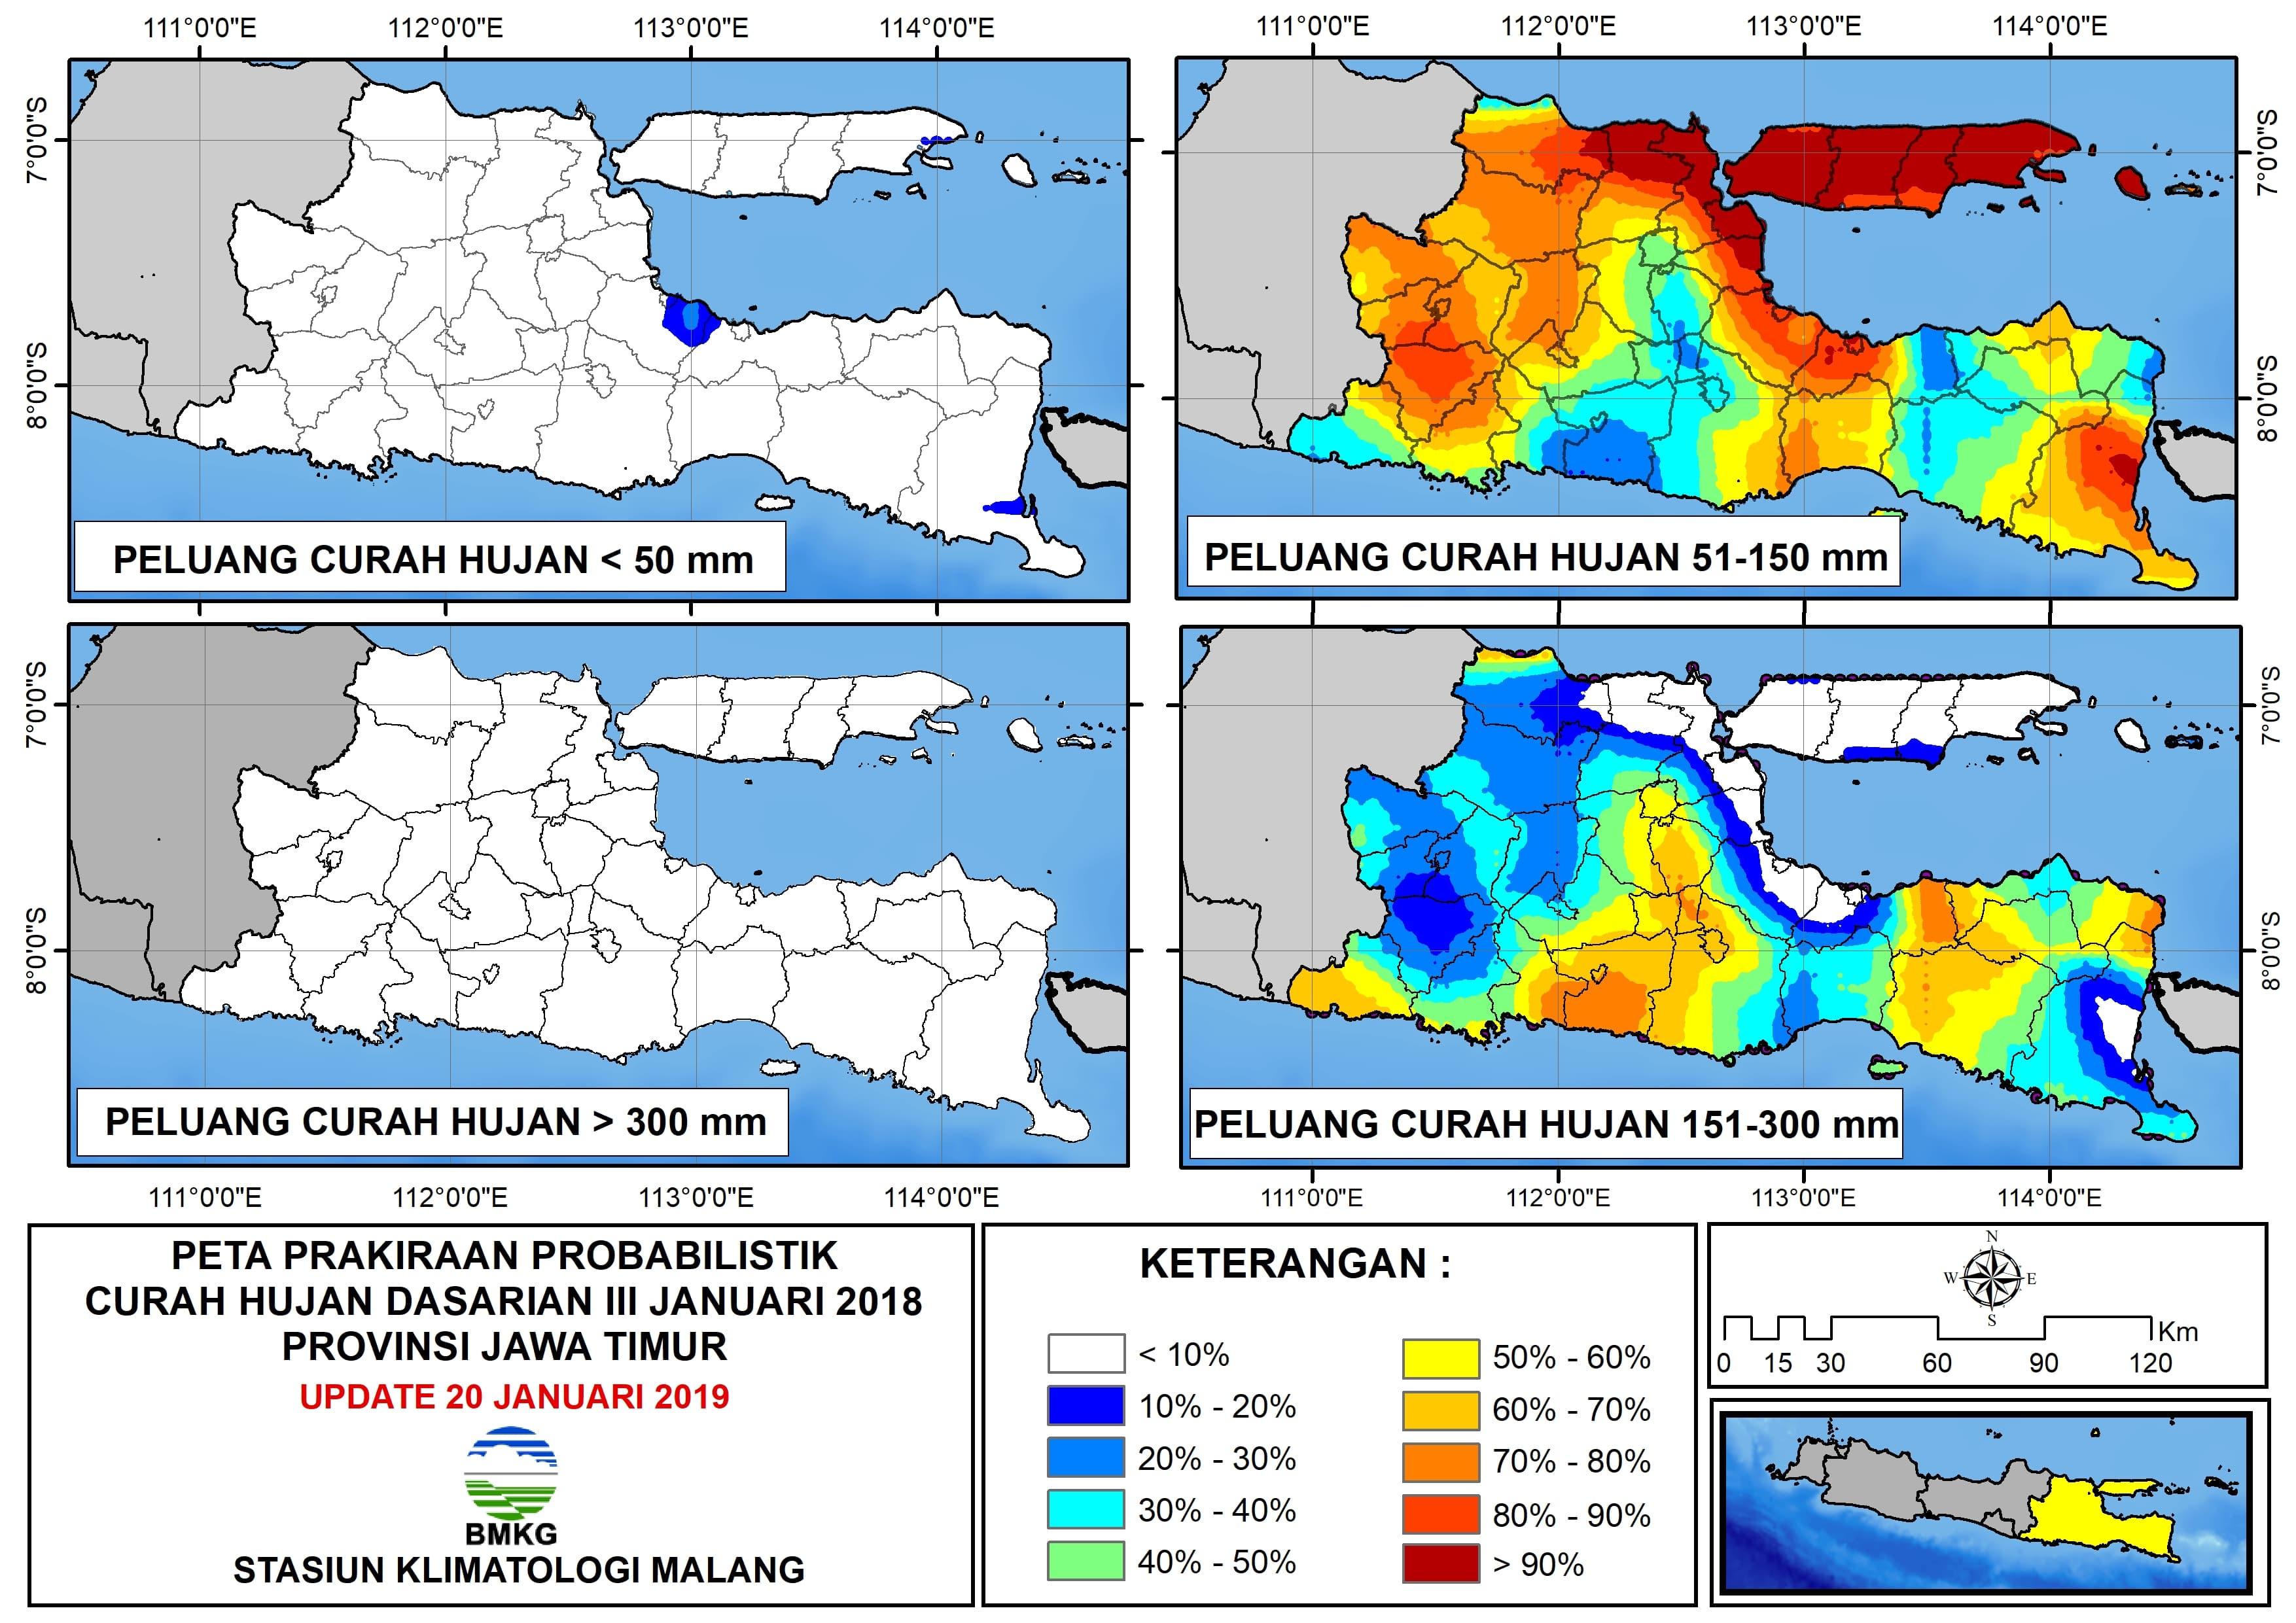 Peta Prakiraan Probabilistik Curah Hujan Dasarian Provinsi Jawa Timur Update 20 Januari 2019